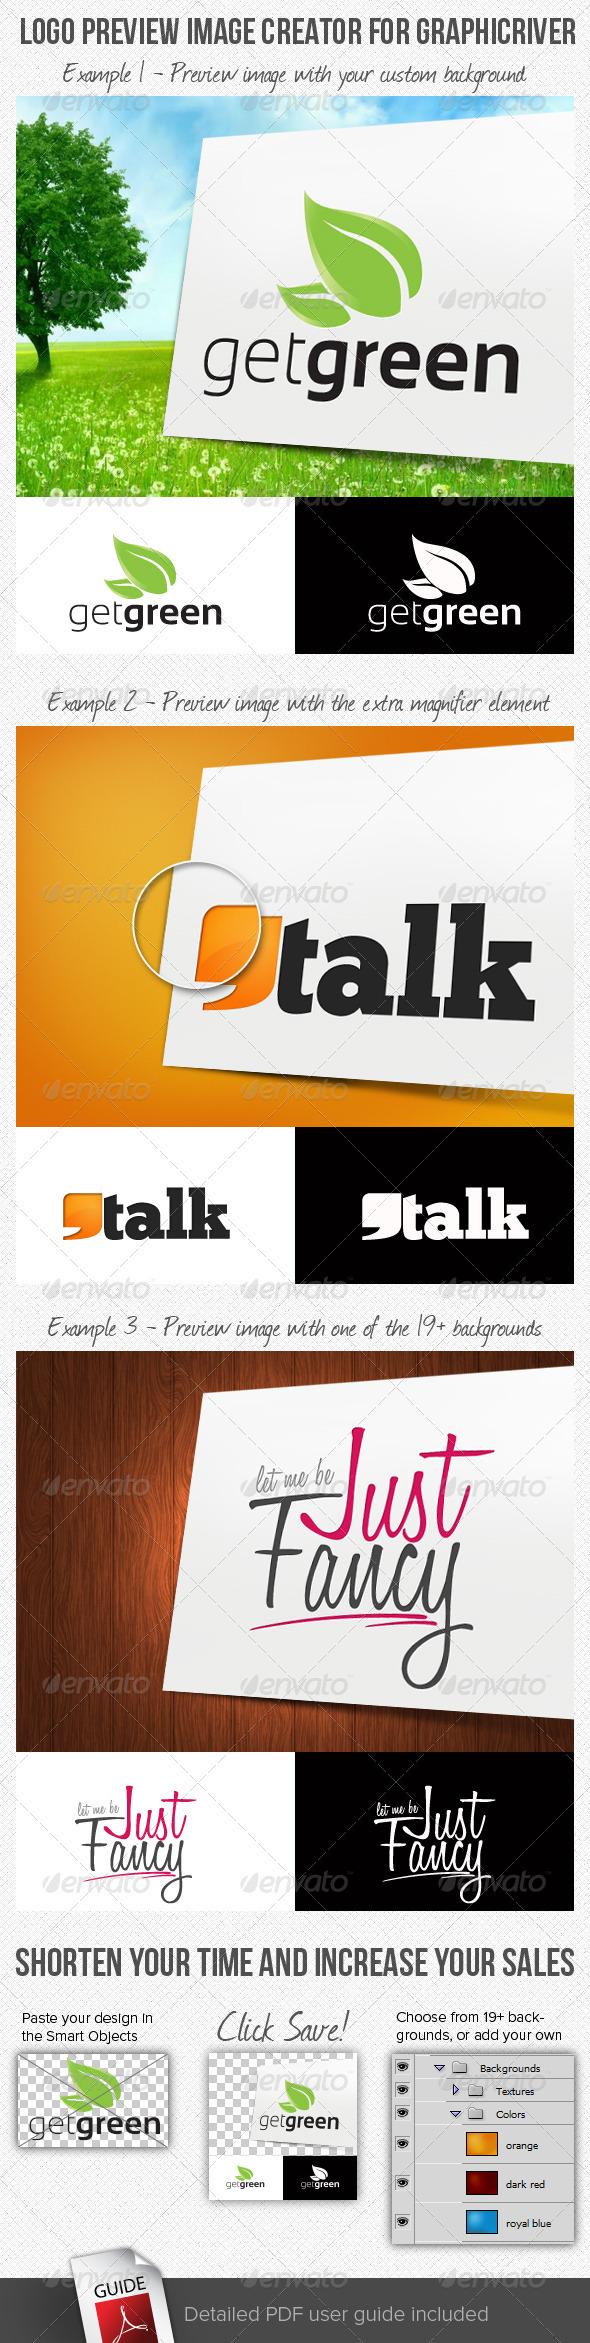 Logo Preview Image Creator for GraphicRiver